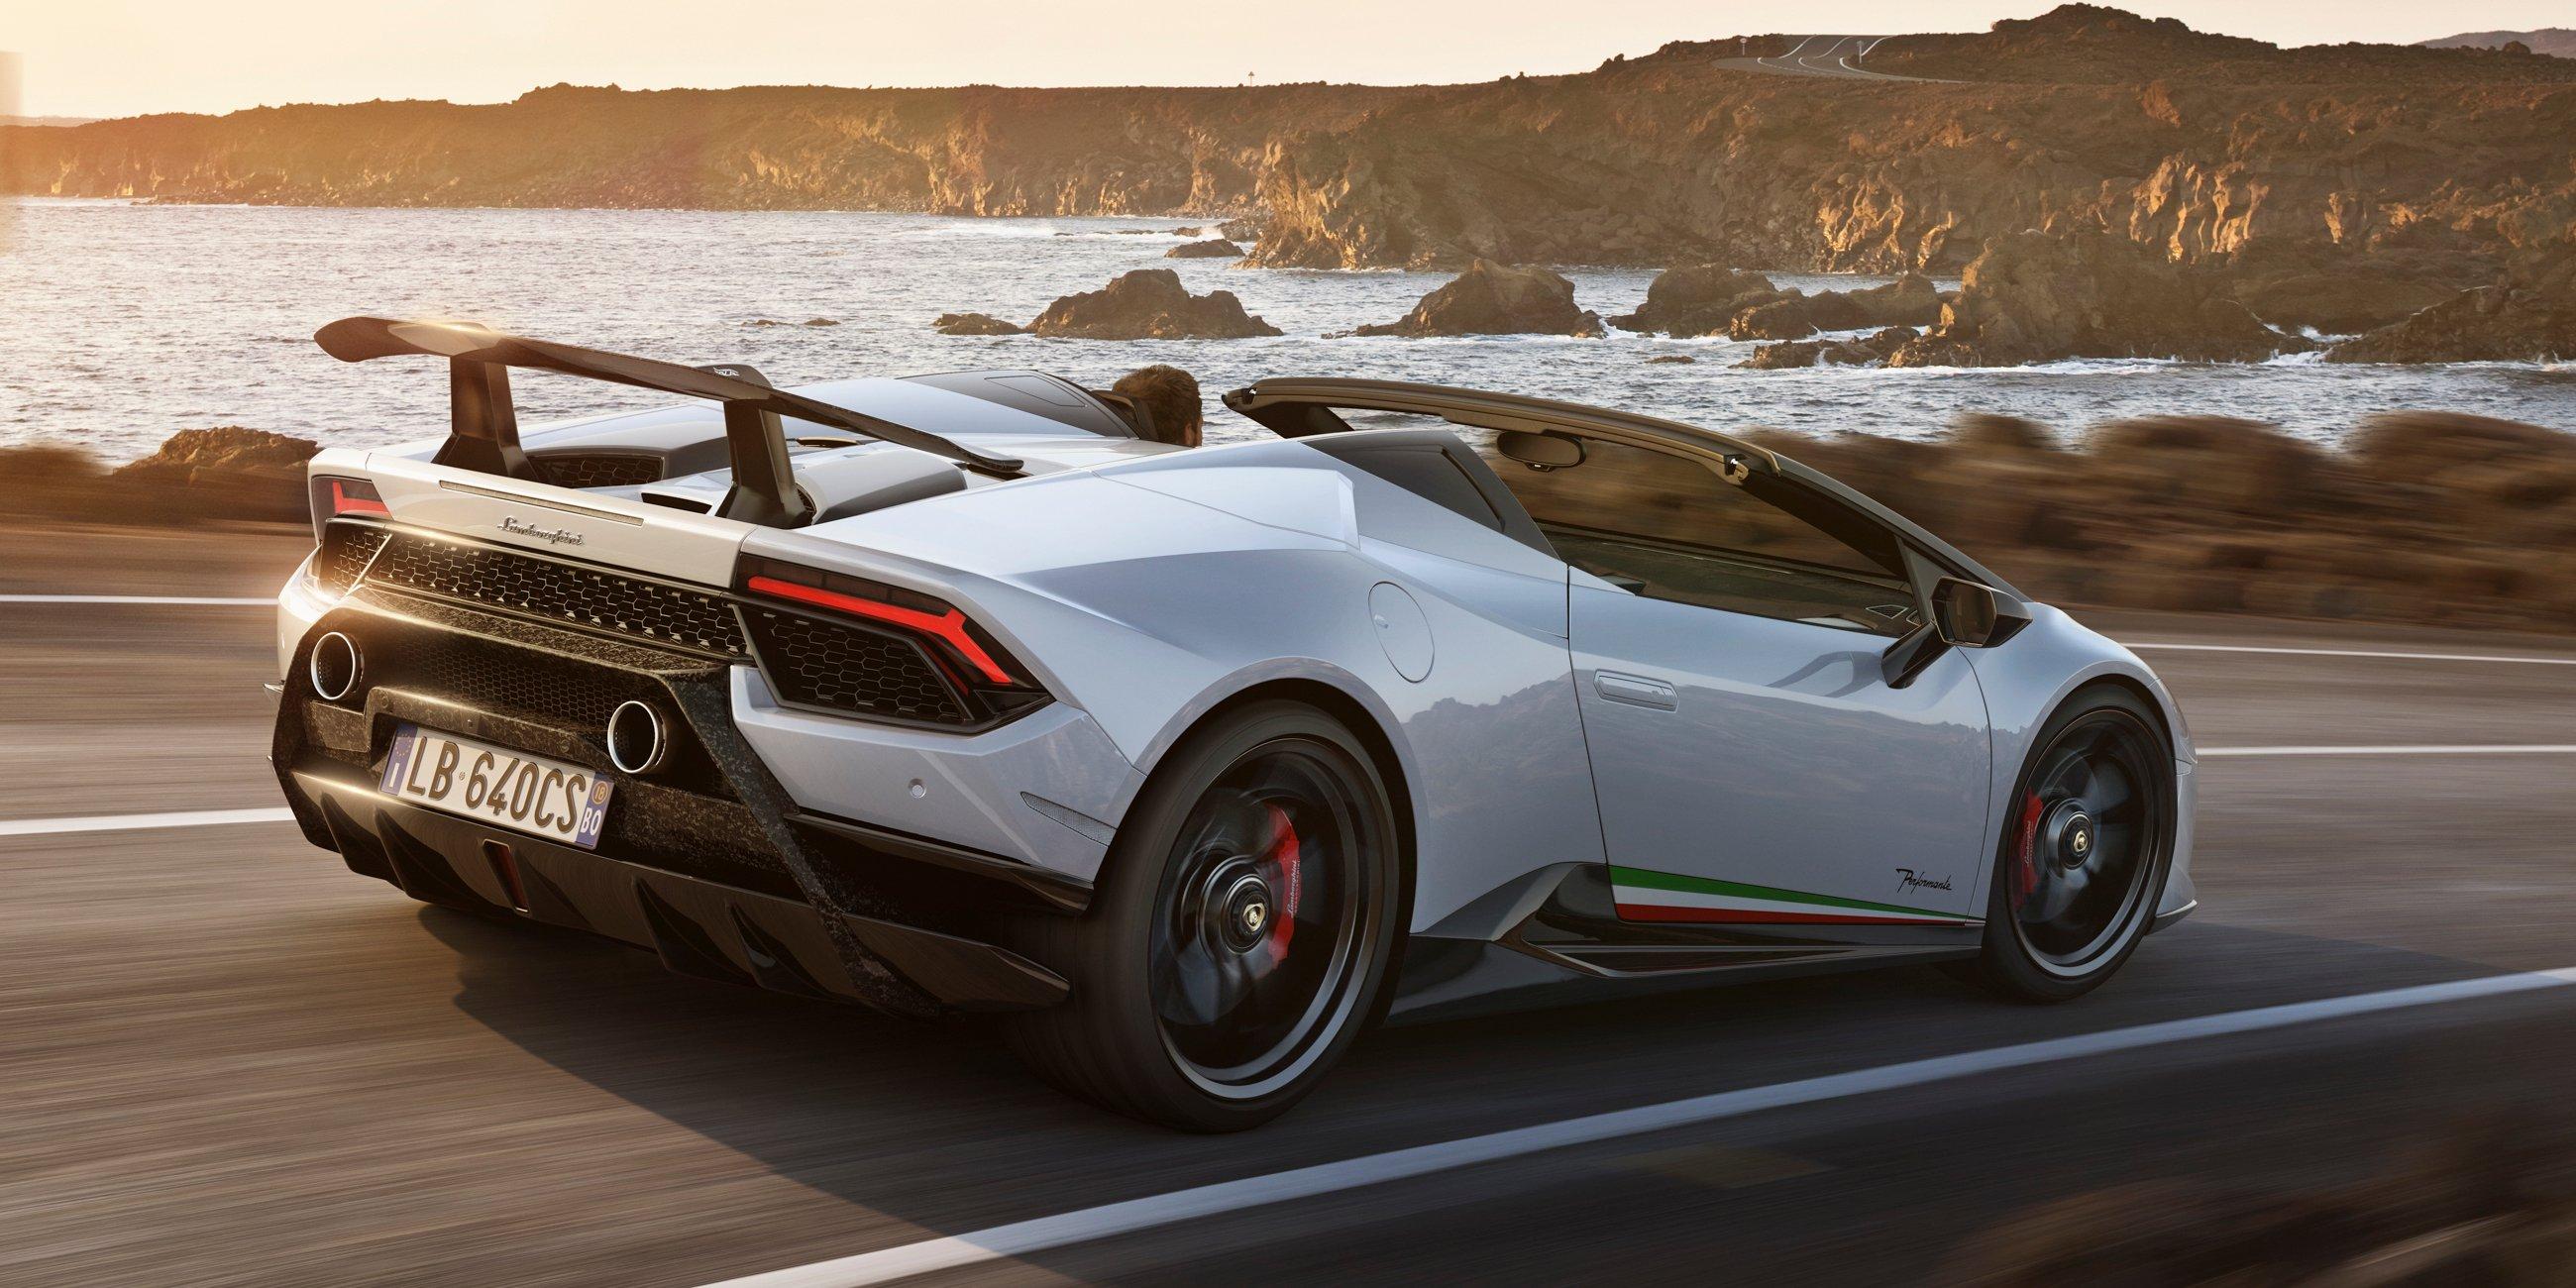 2018 Lamborghini Huracan Performante Spyder Revealed